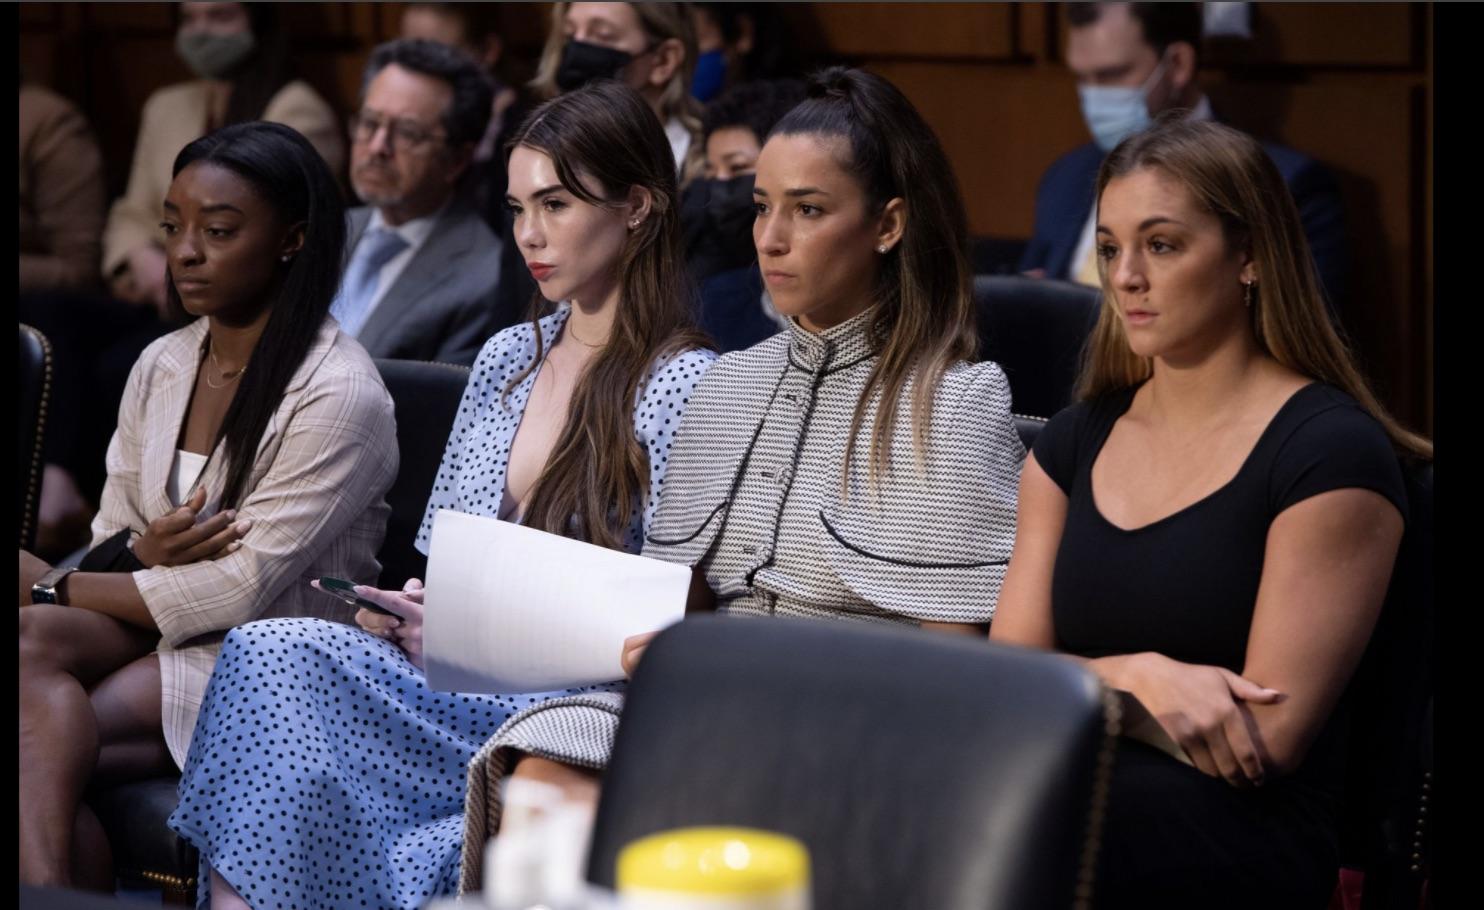 L-R Simone Biles, McKayla Maroney, Aly Raisman and Maggie Nichols at the U.S. Senate on Wednesday